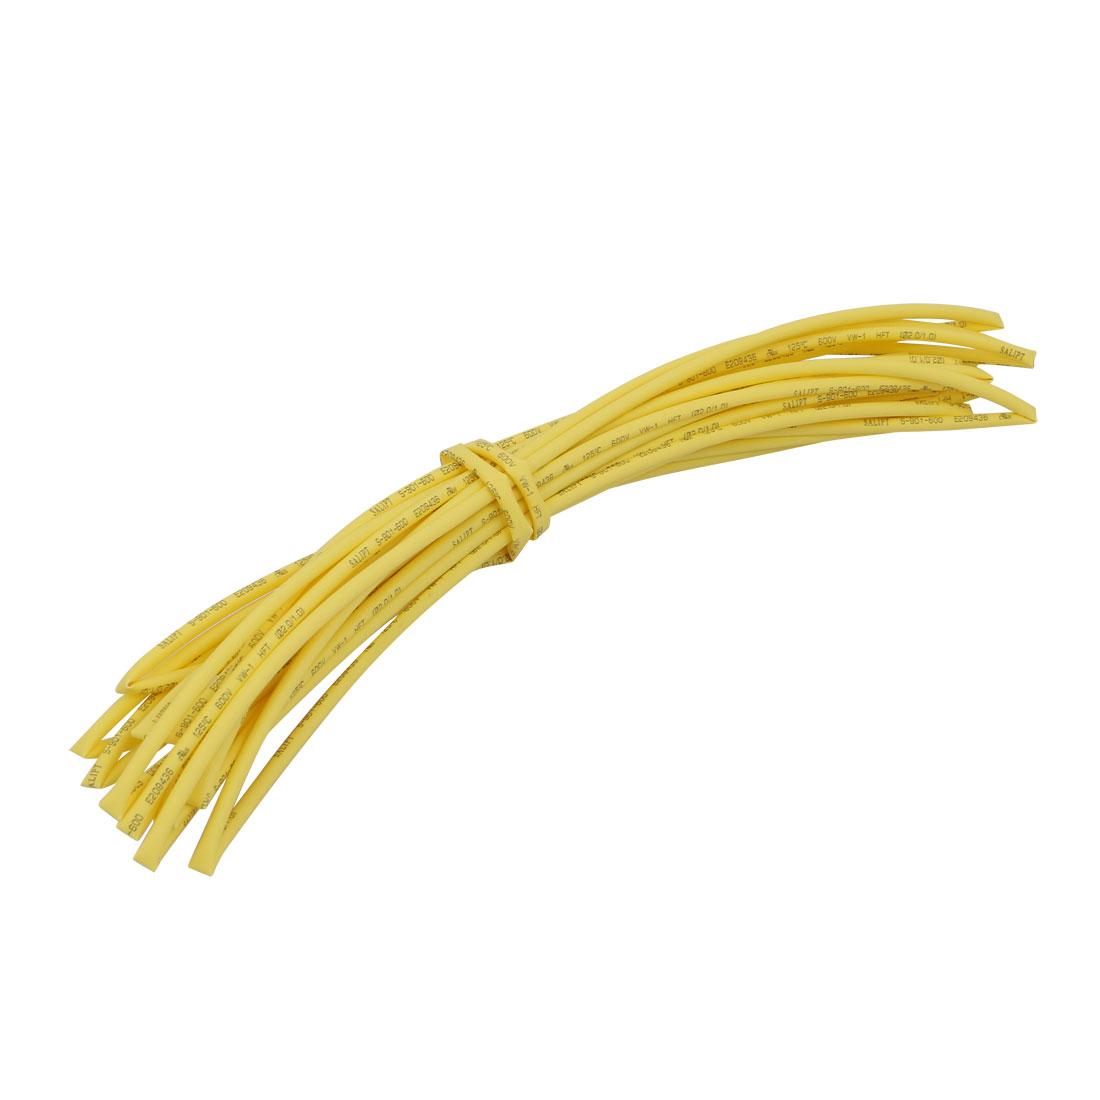 5M x 0.08in Inner Dia Polyolefin Flame Retardant Tube Yellow for Wire Repairing